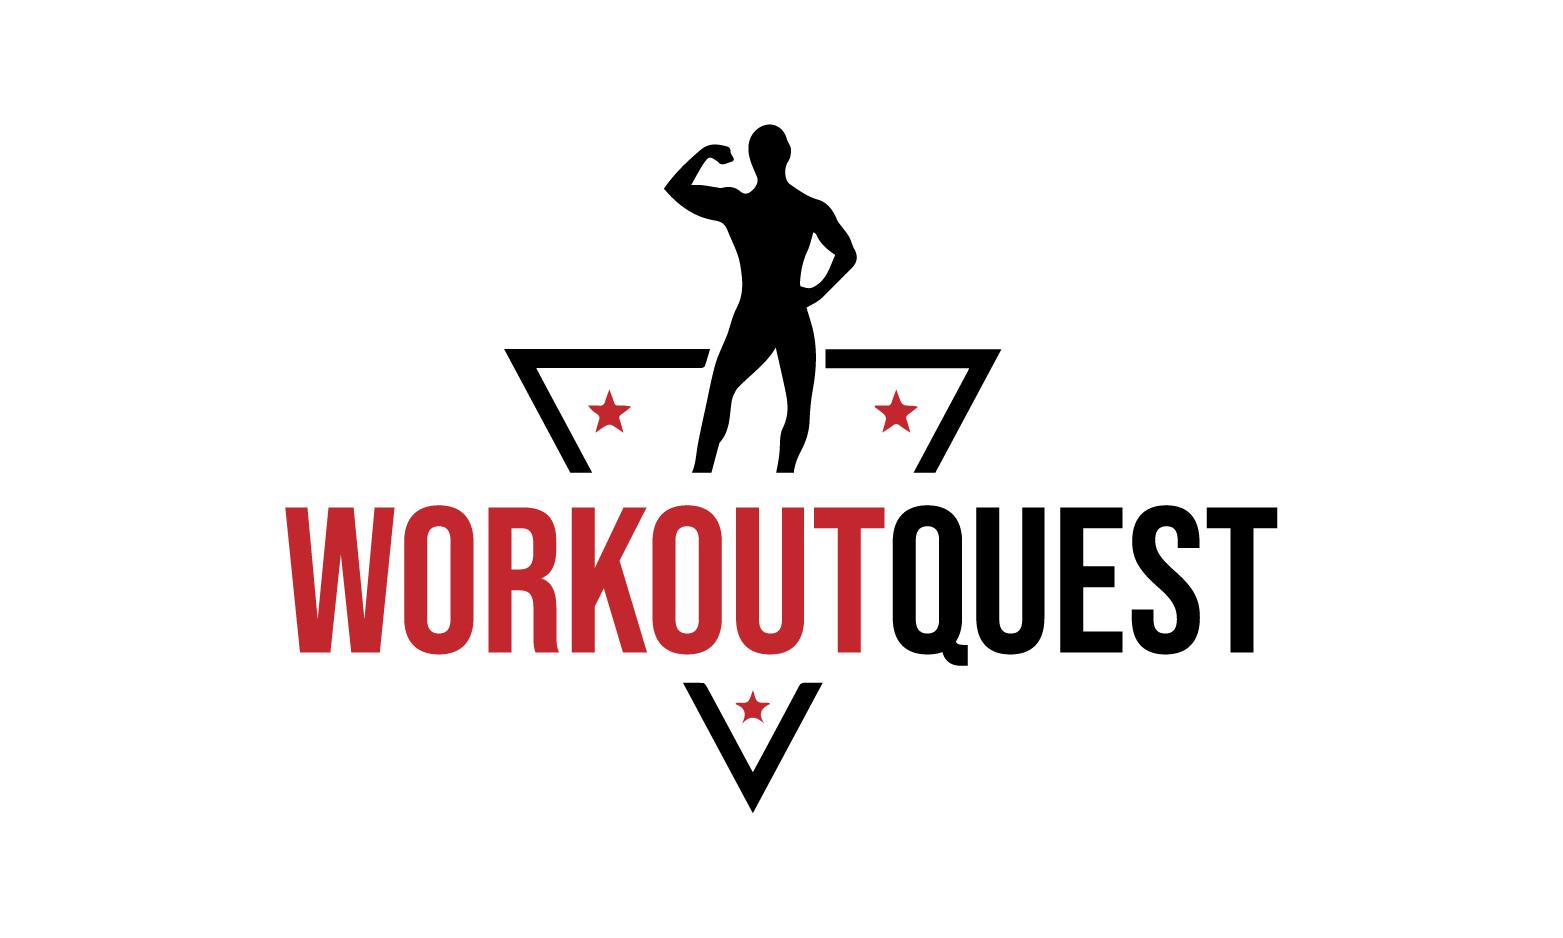 WorkoutQuest.com